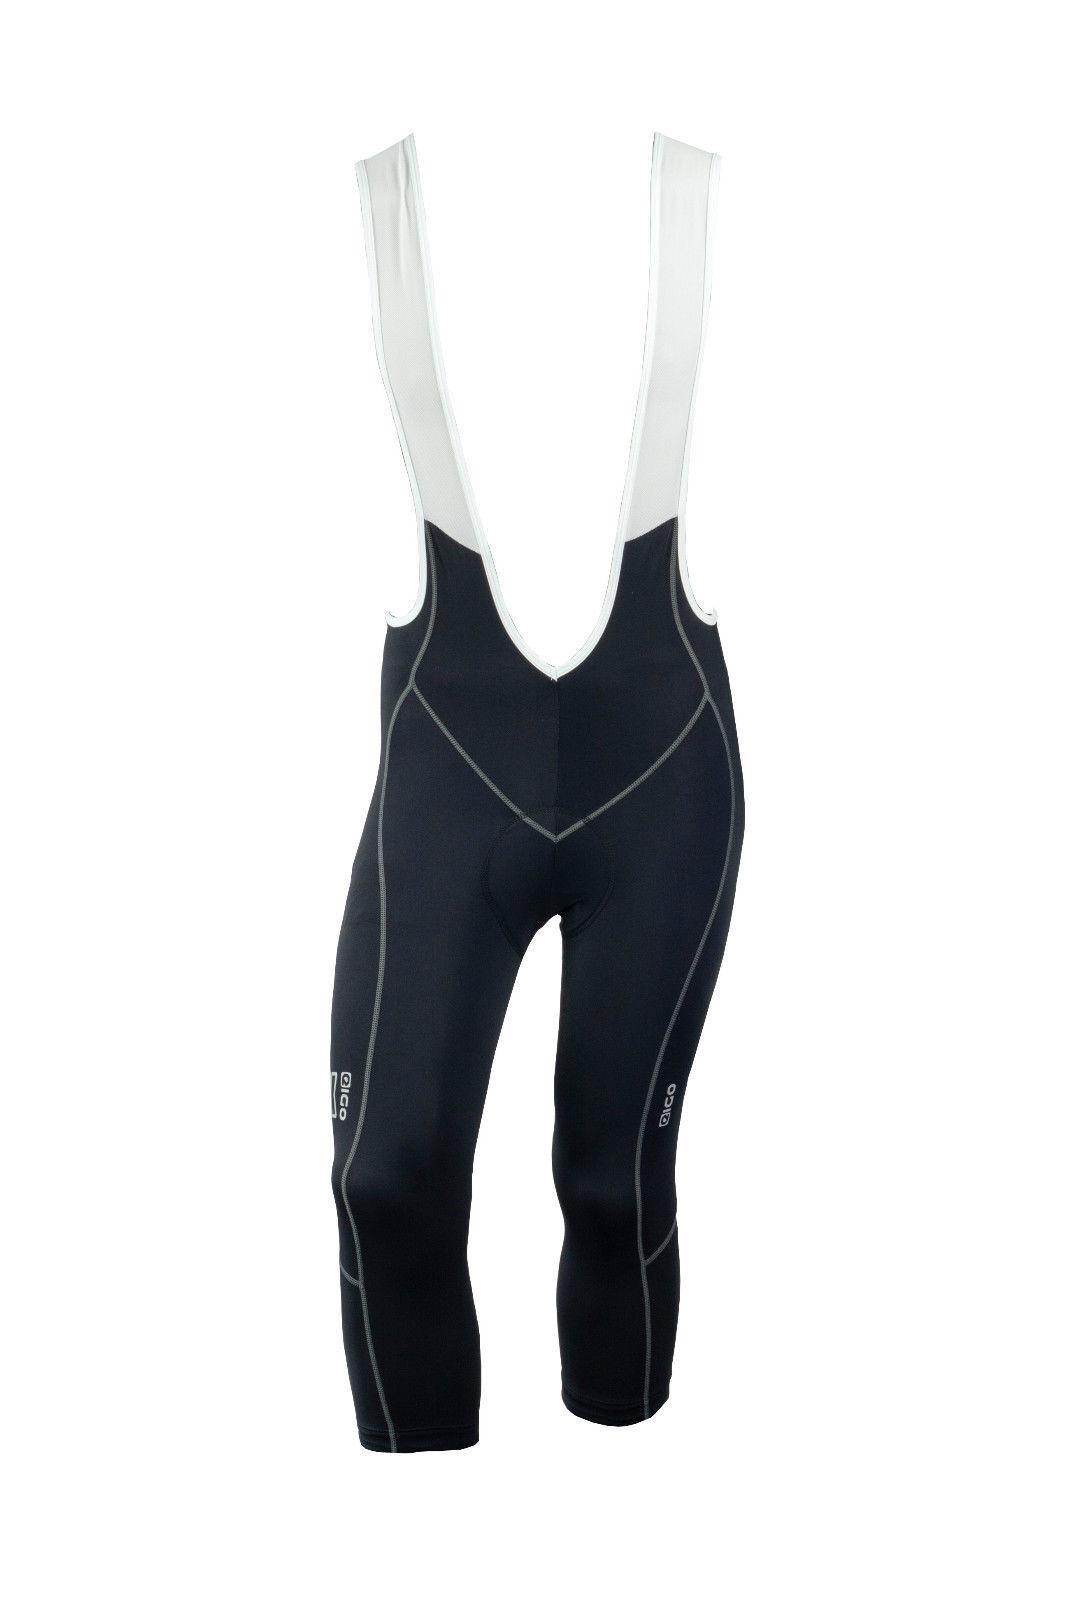 New Mens Cycling   Spin   Spinning Eigo Lycra 'Prime' 3 4 Length Bib Shorts